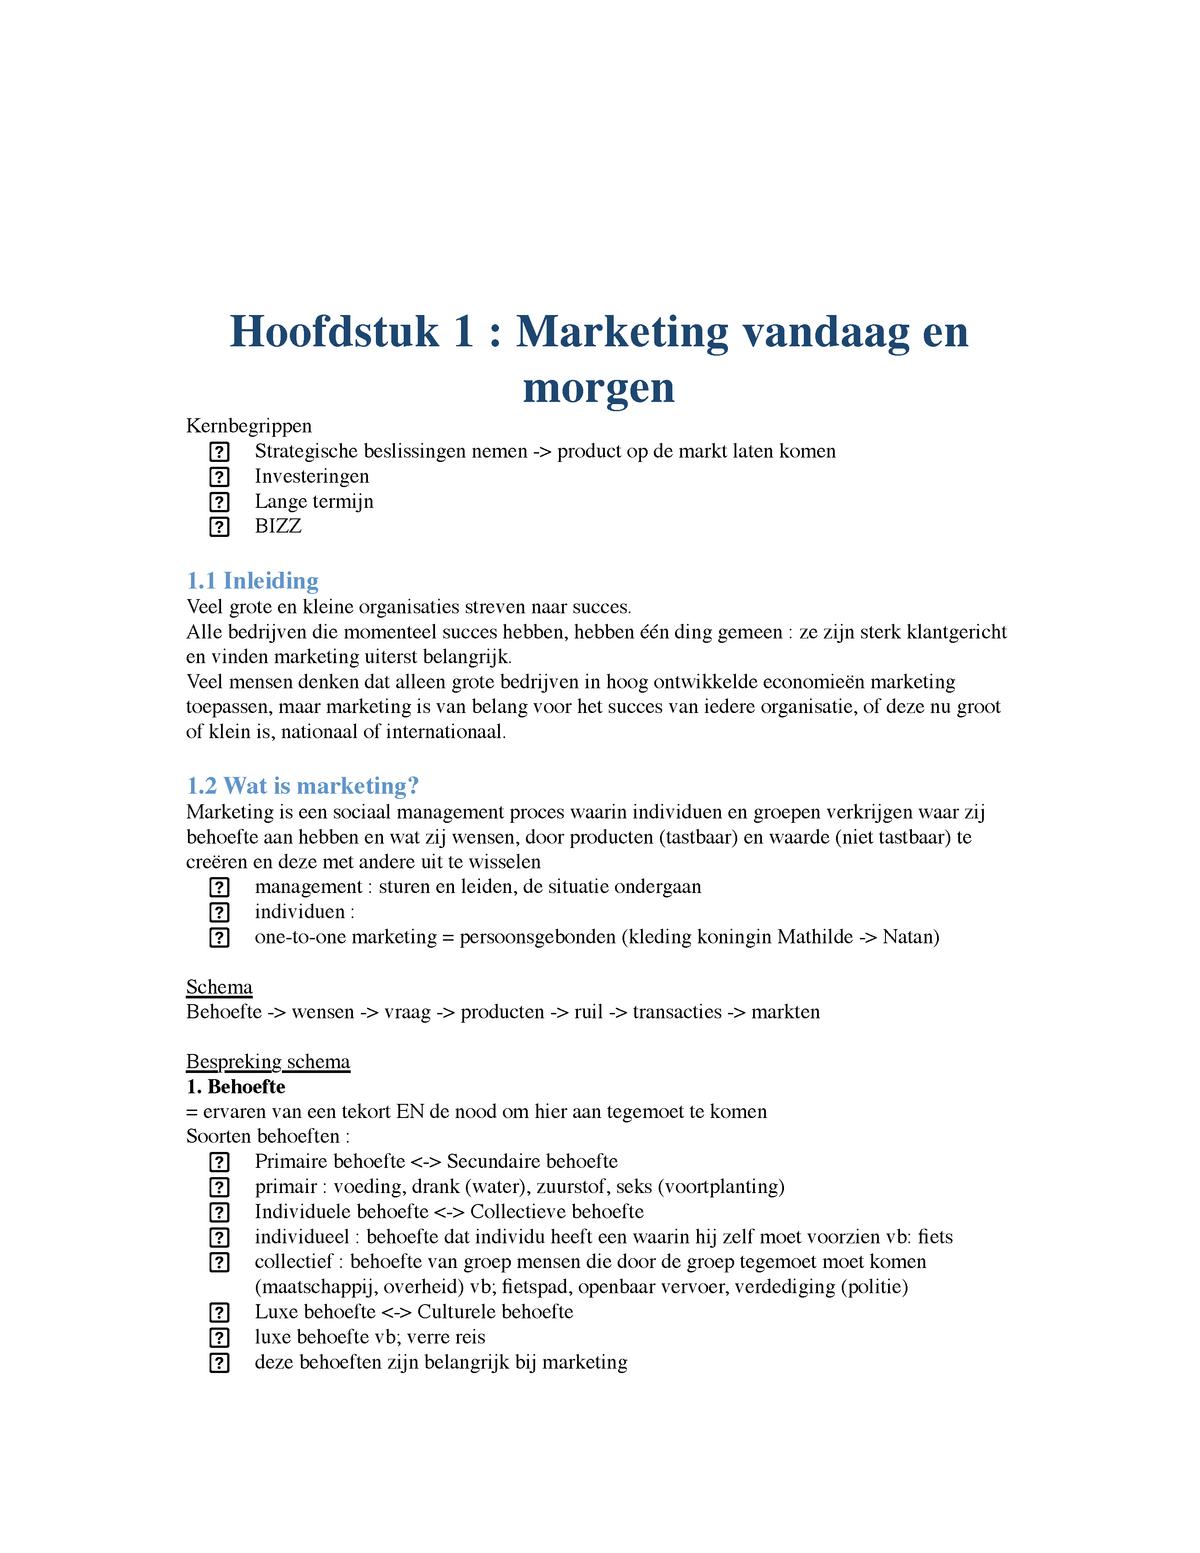 805cf1a3a4a Hfst 1 Marketing - kotler - HBH49A - StuDocu